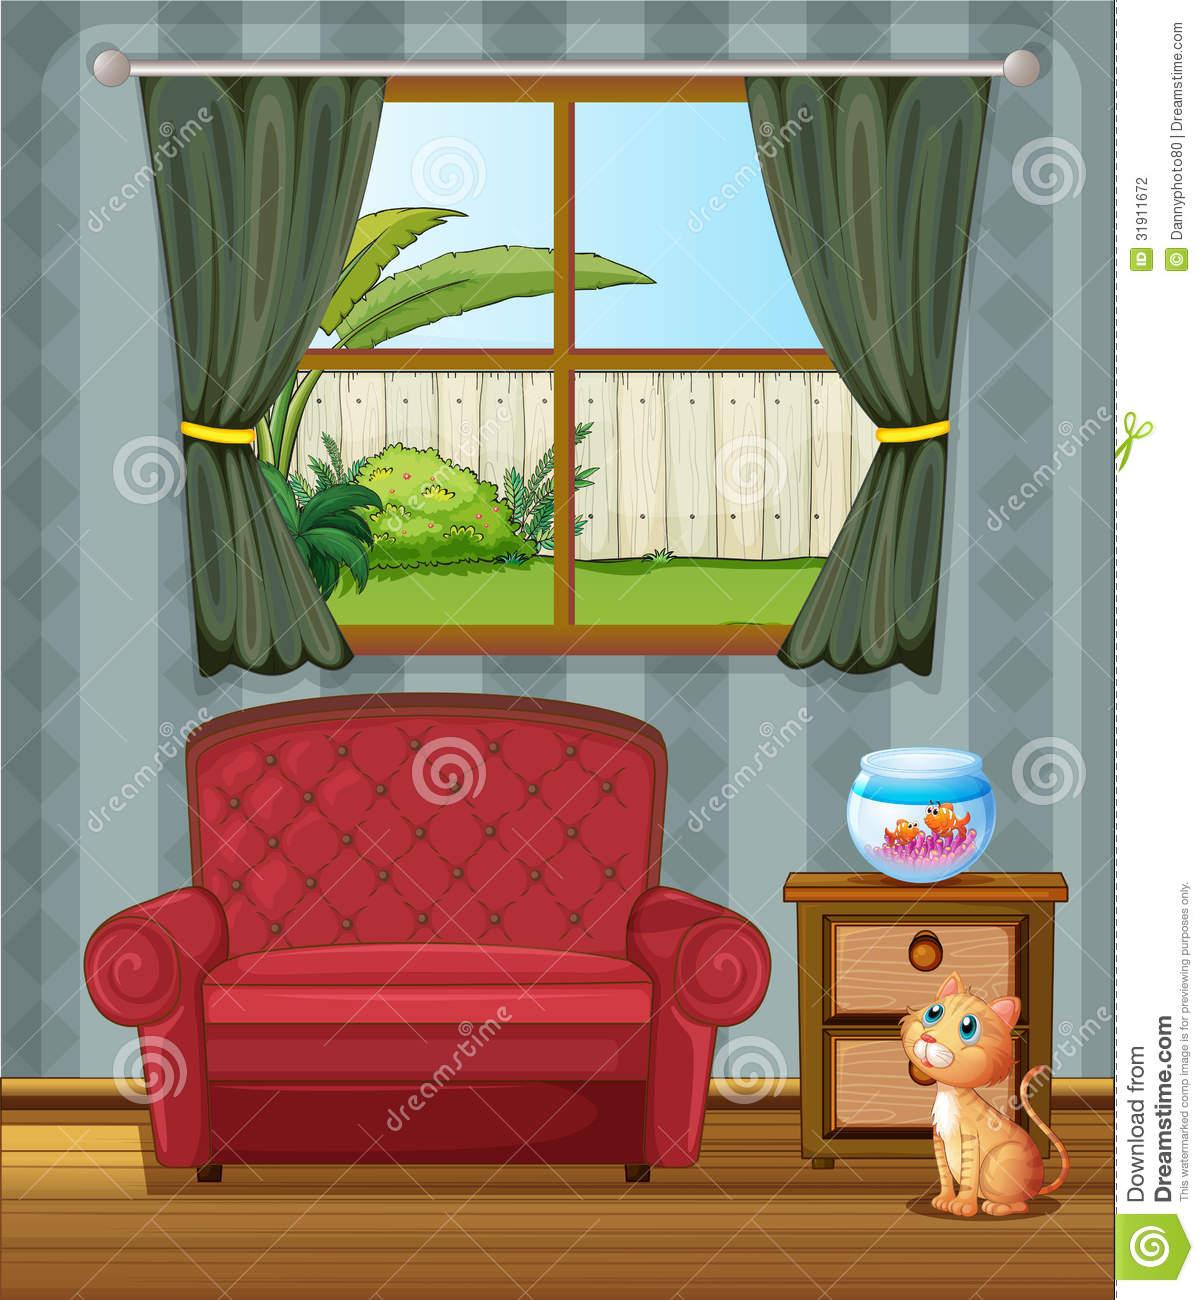 Inside clipart house interior Inside Clip Images Panda Art